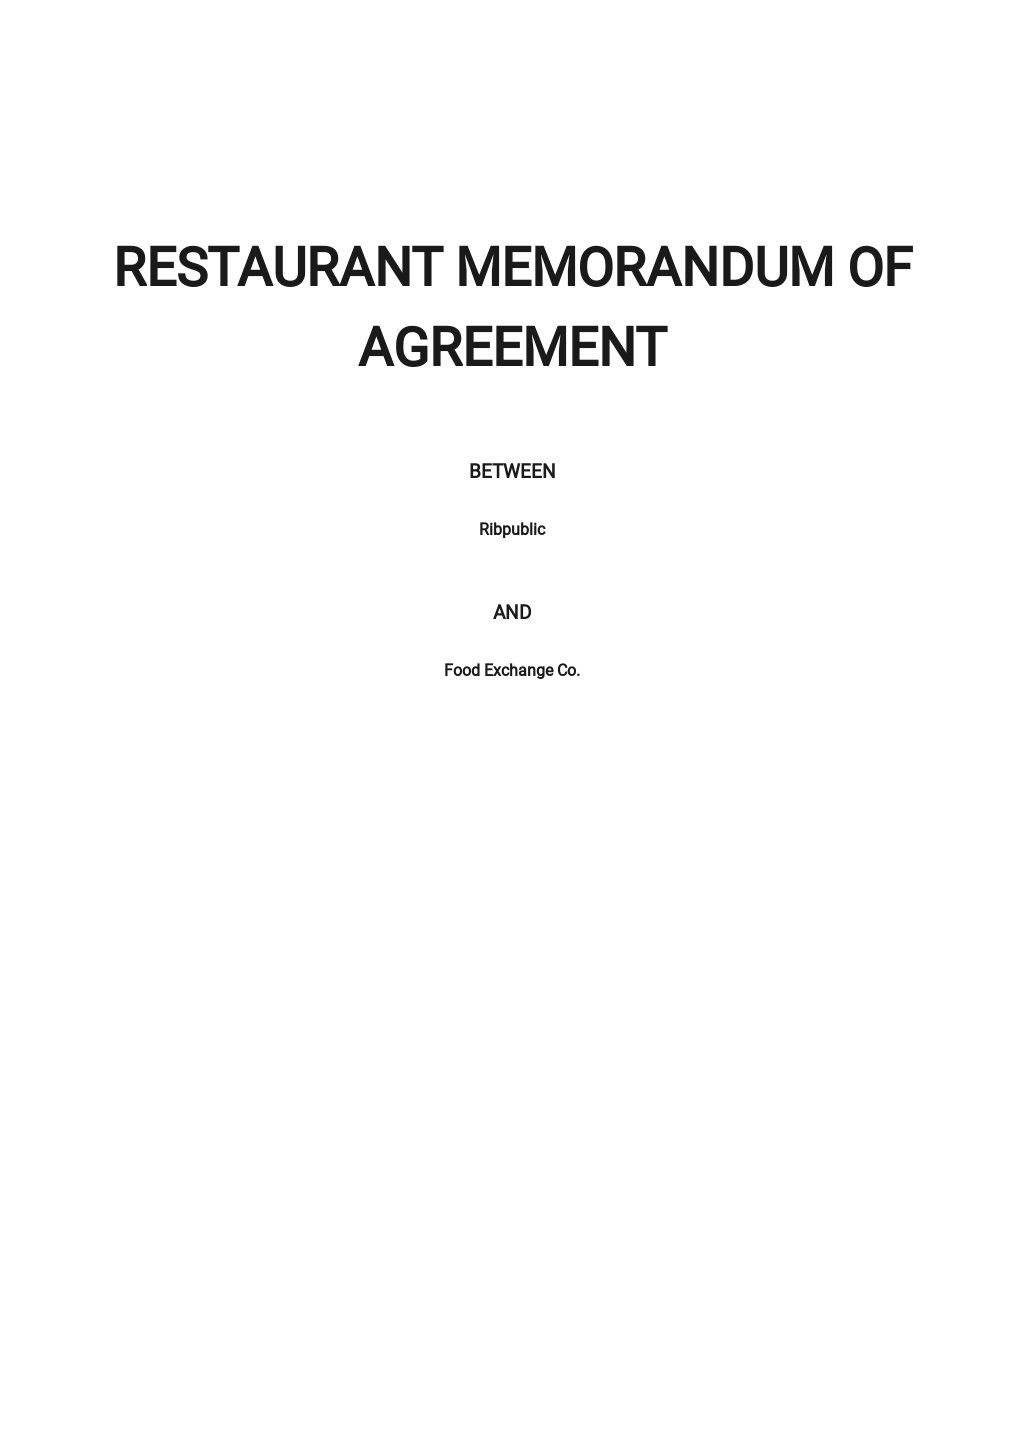 Restaurant Memorandum of Agreement Template